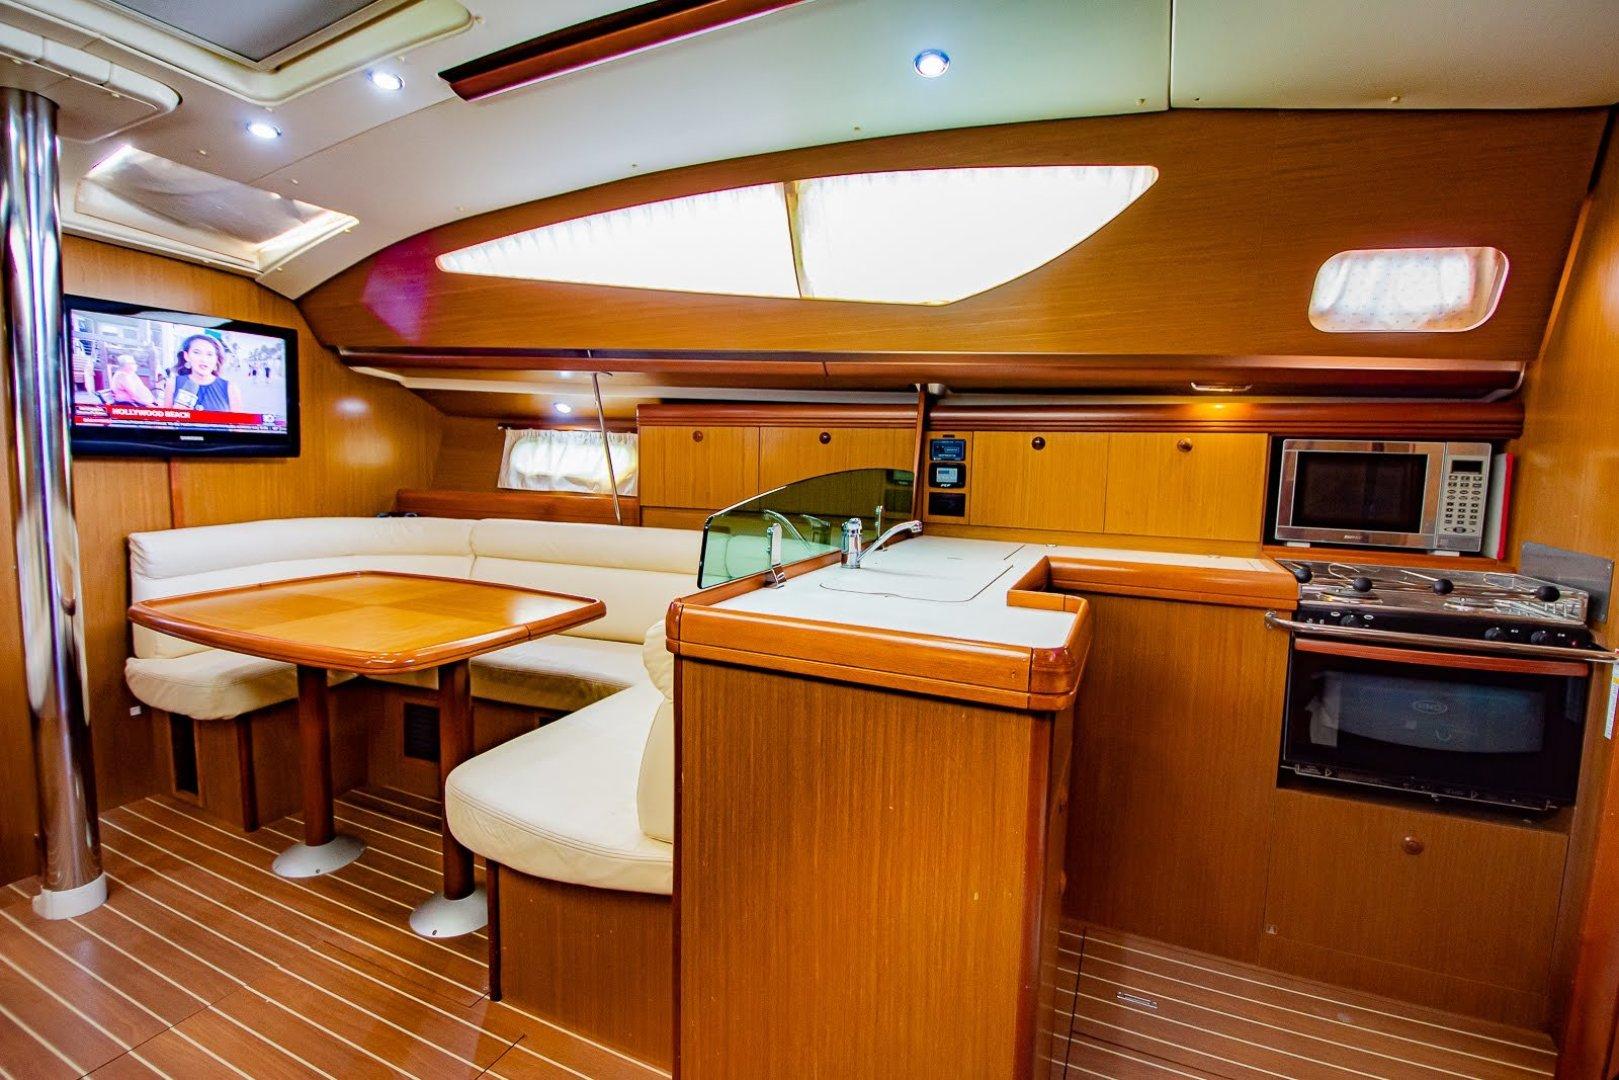 Jeanneau-42DS 2007-Layla Fort Lauderdale-Florida-United States-Jeanneau 42DS-1551263 | Thumbnail